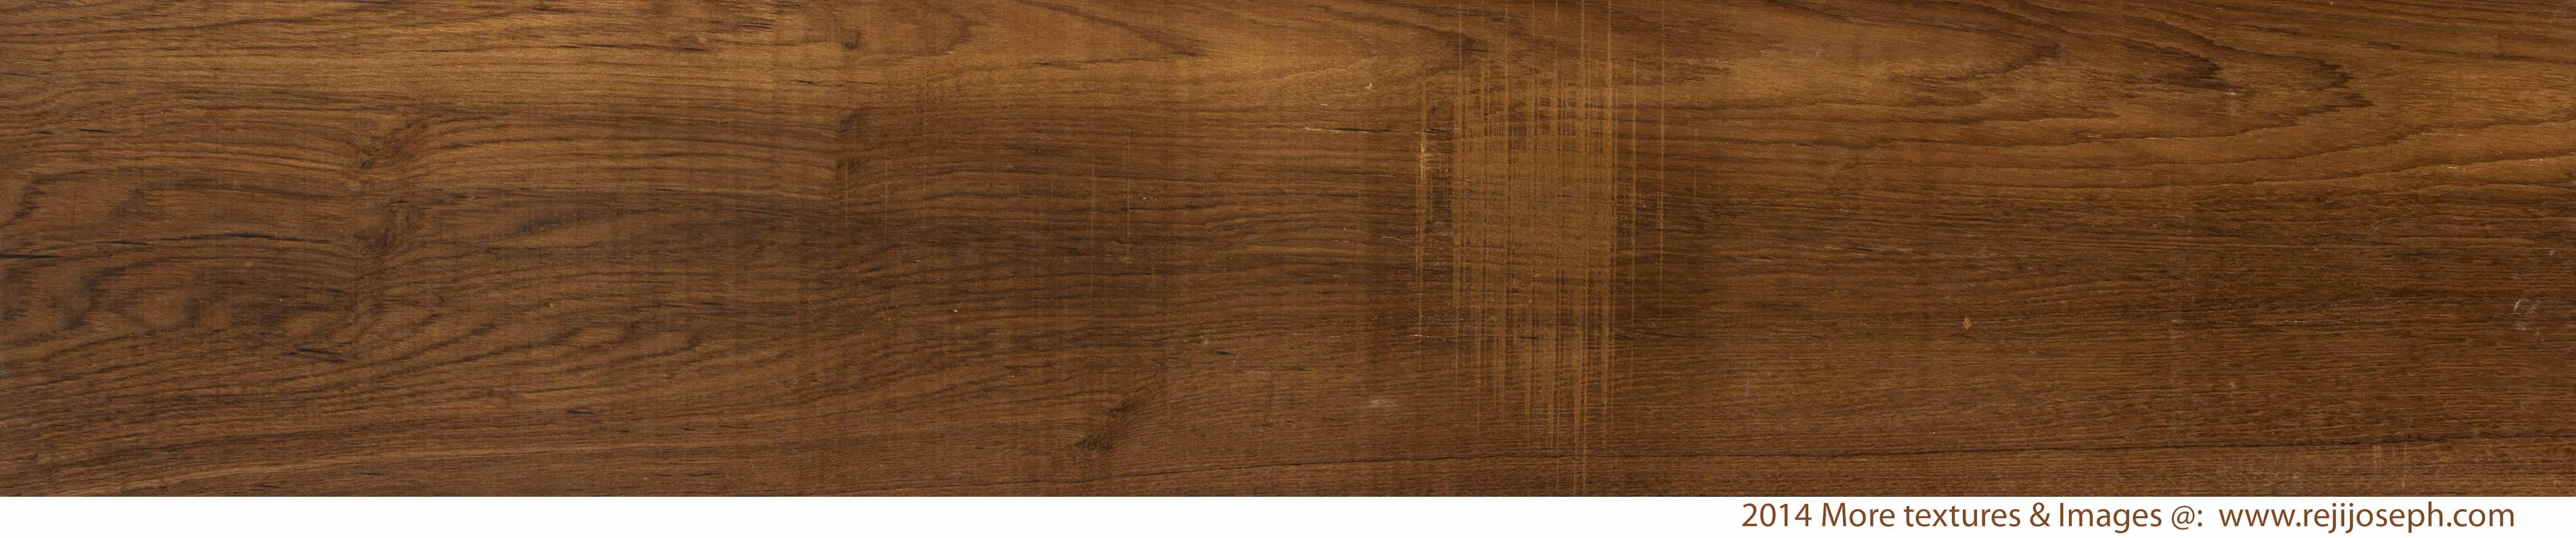 Plane Wood texture 00007